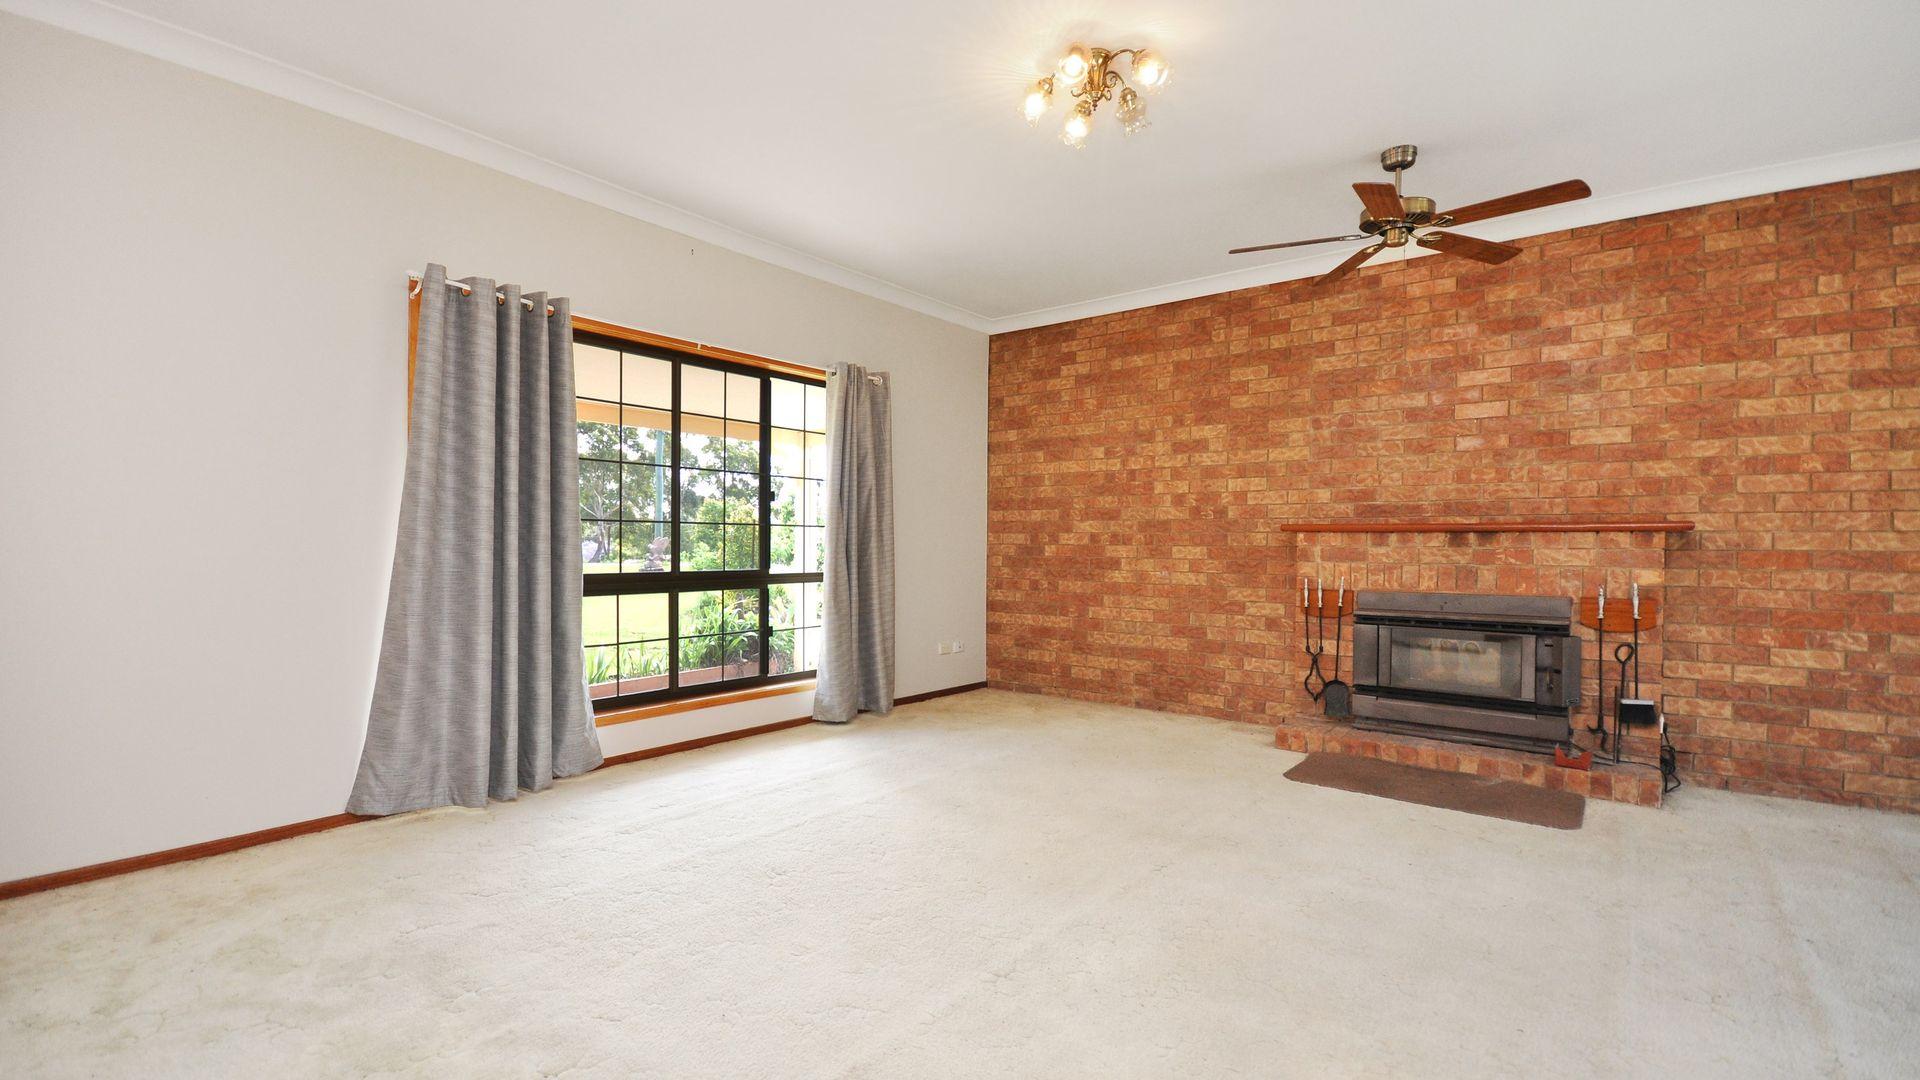 11 Alvisio Court, Narangba QLD 4504, Image 1